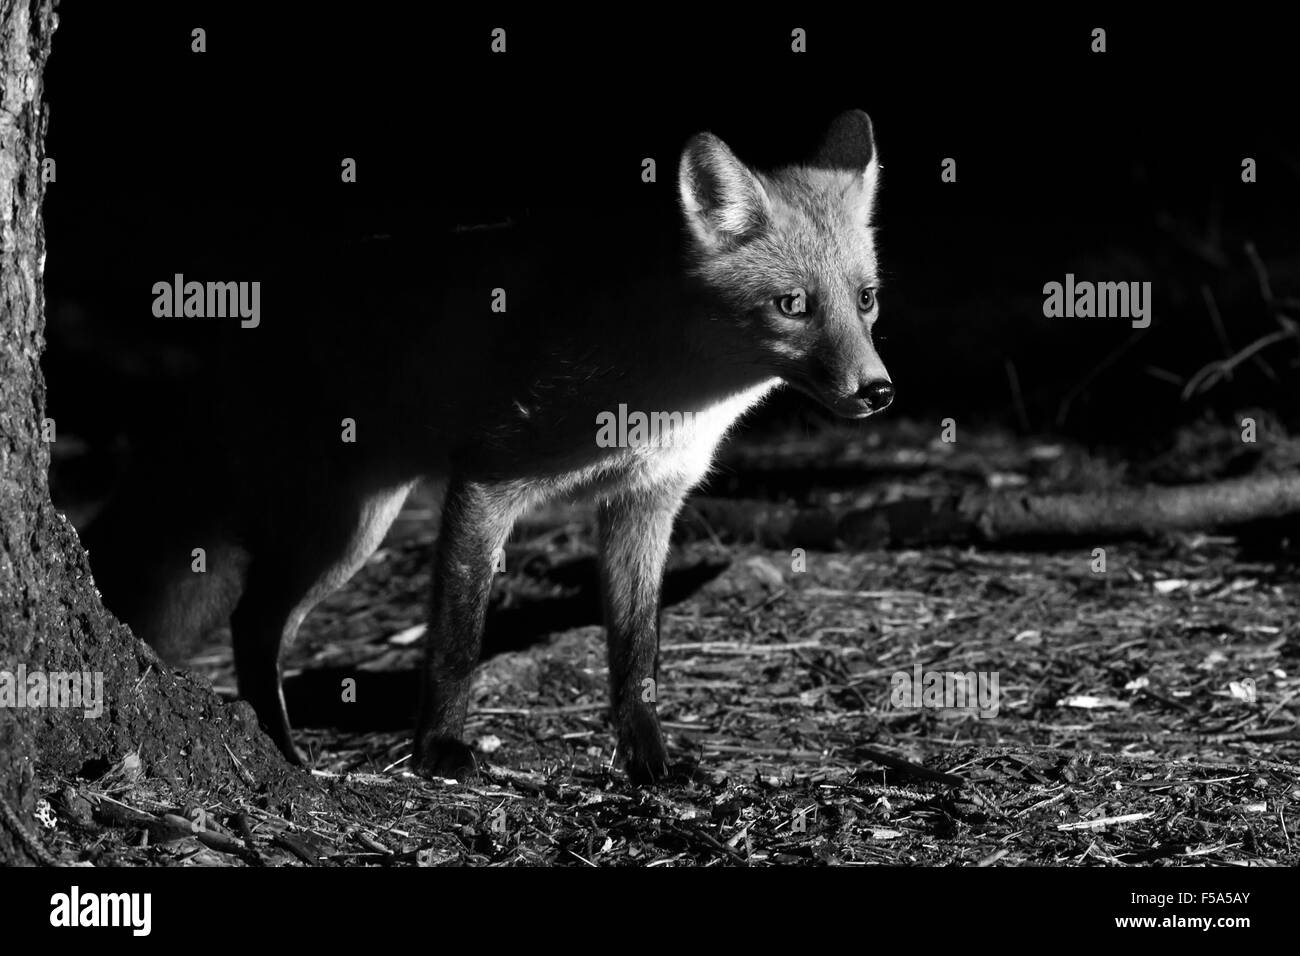 Fox night photography hunting - Stock Image